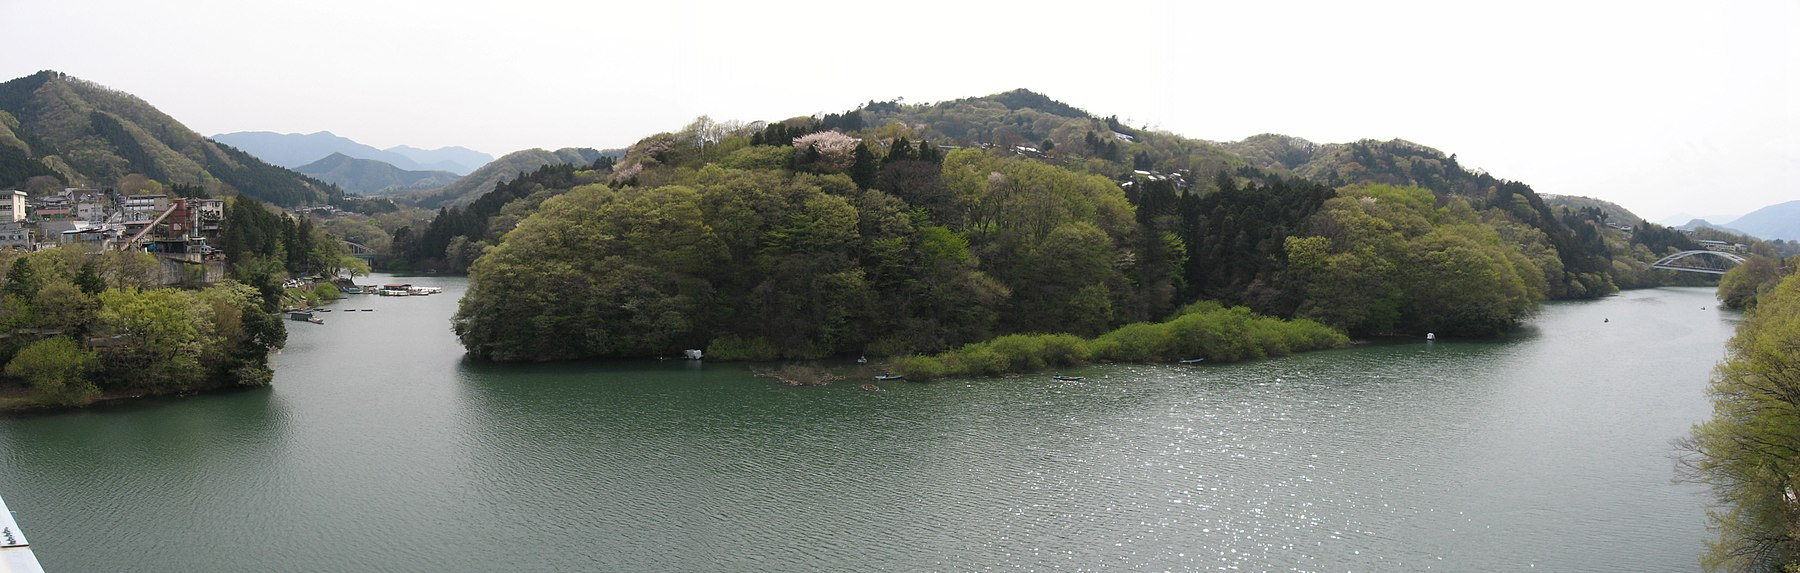 Lake Sagami from Hizure bridge.JPG